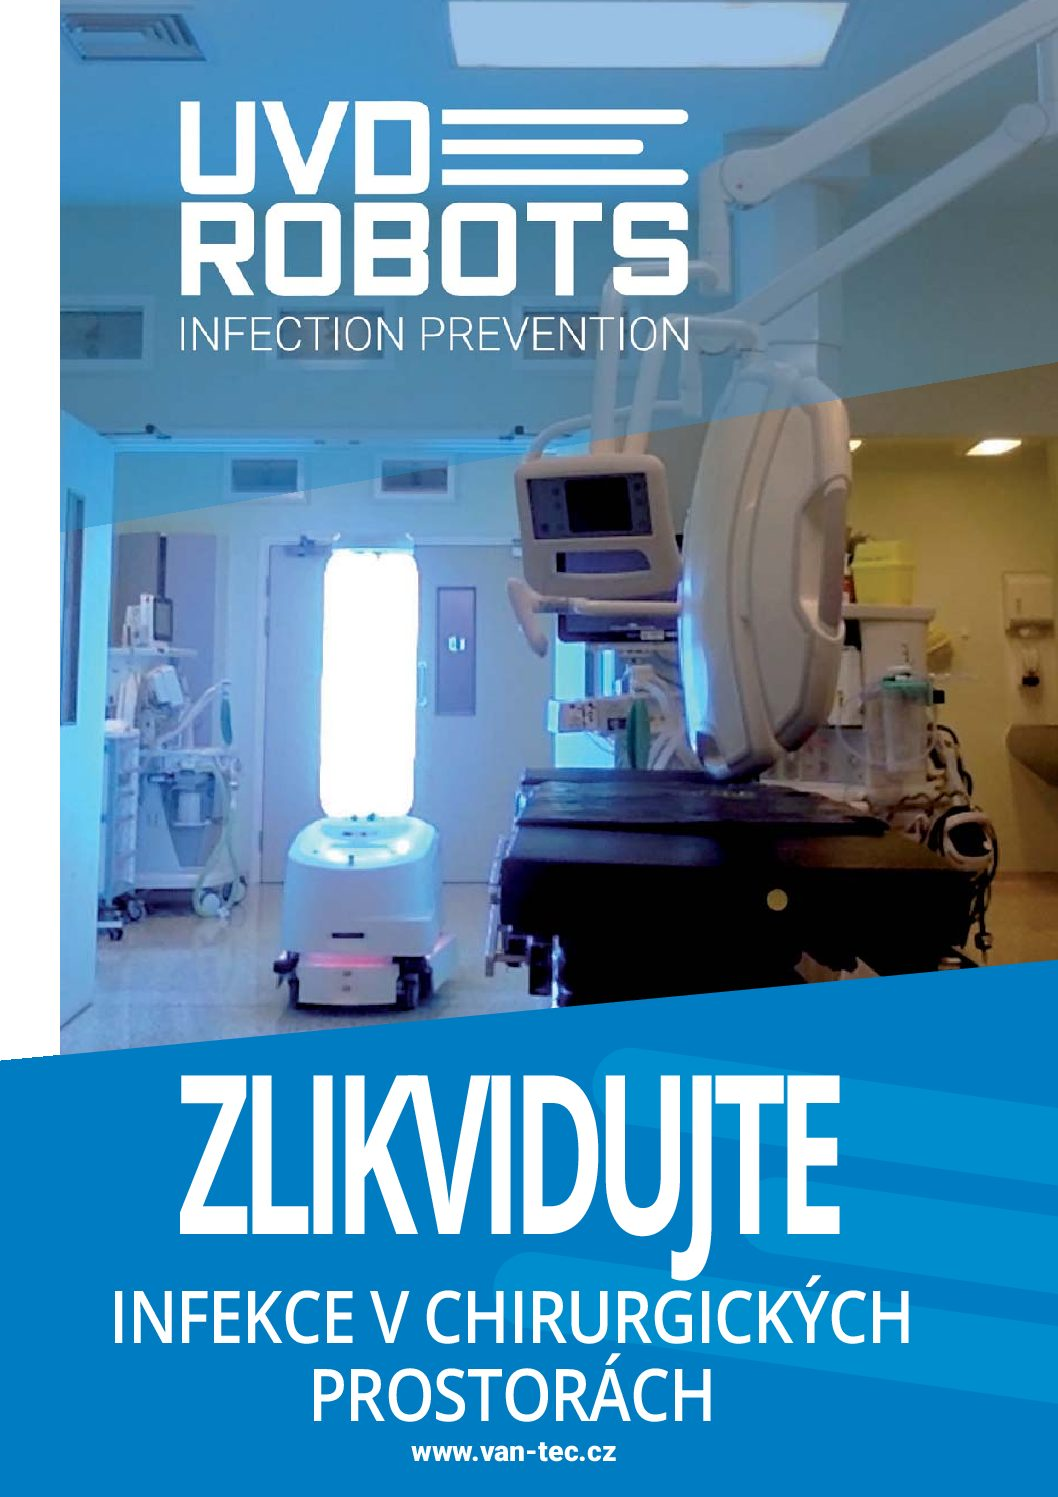 UVD robots-1